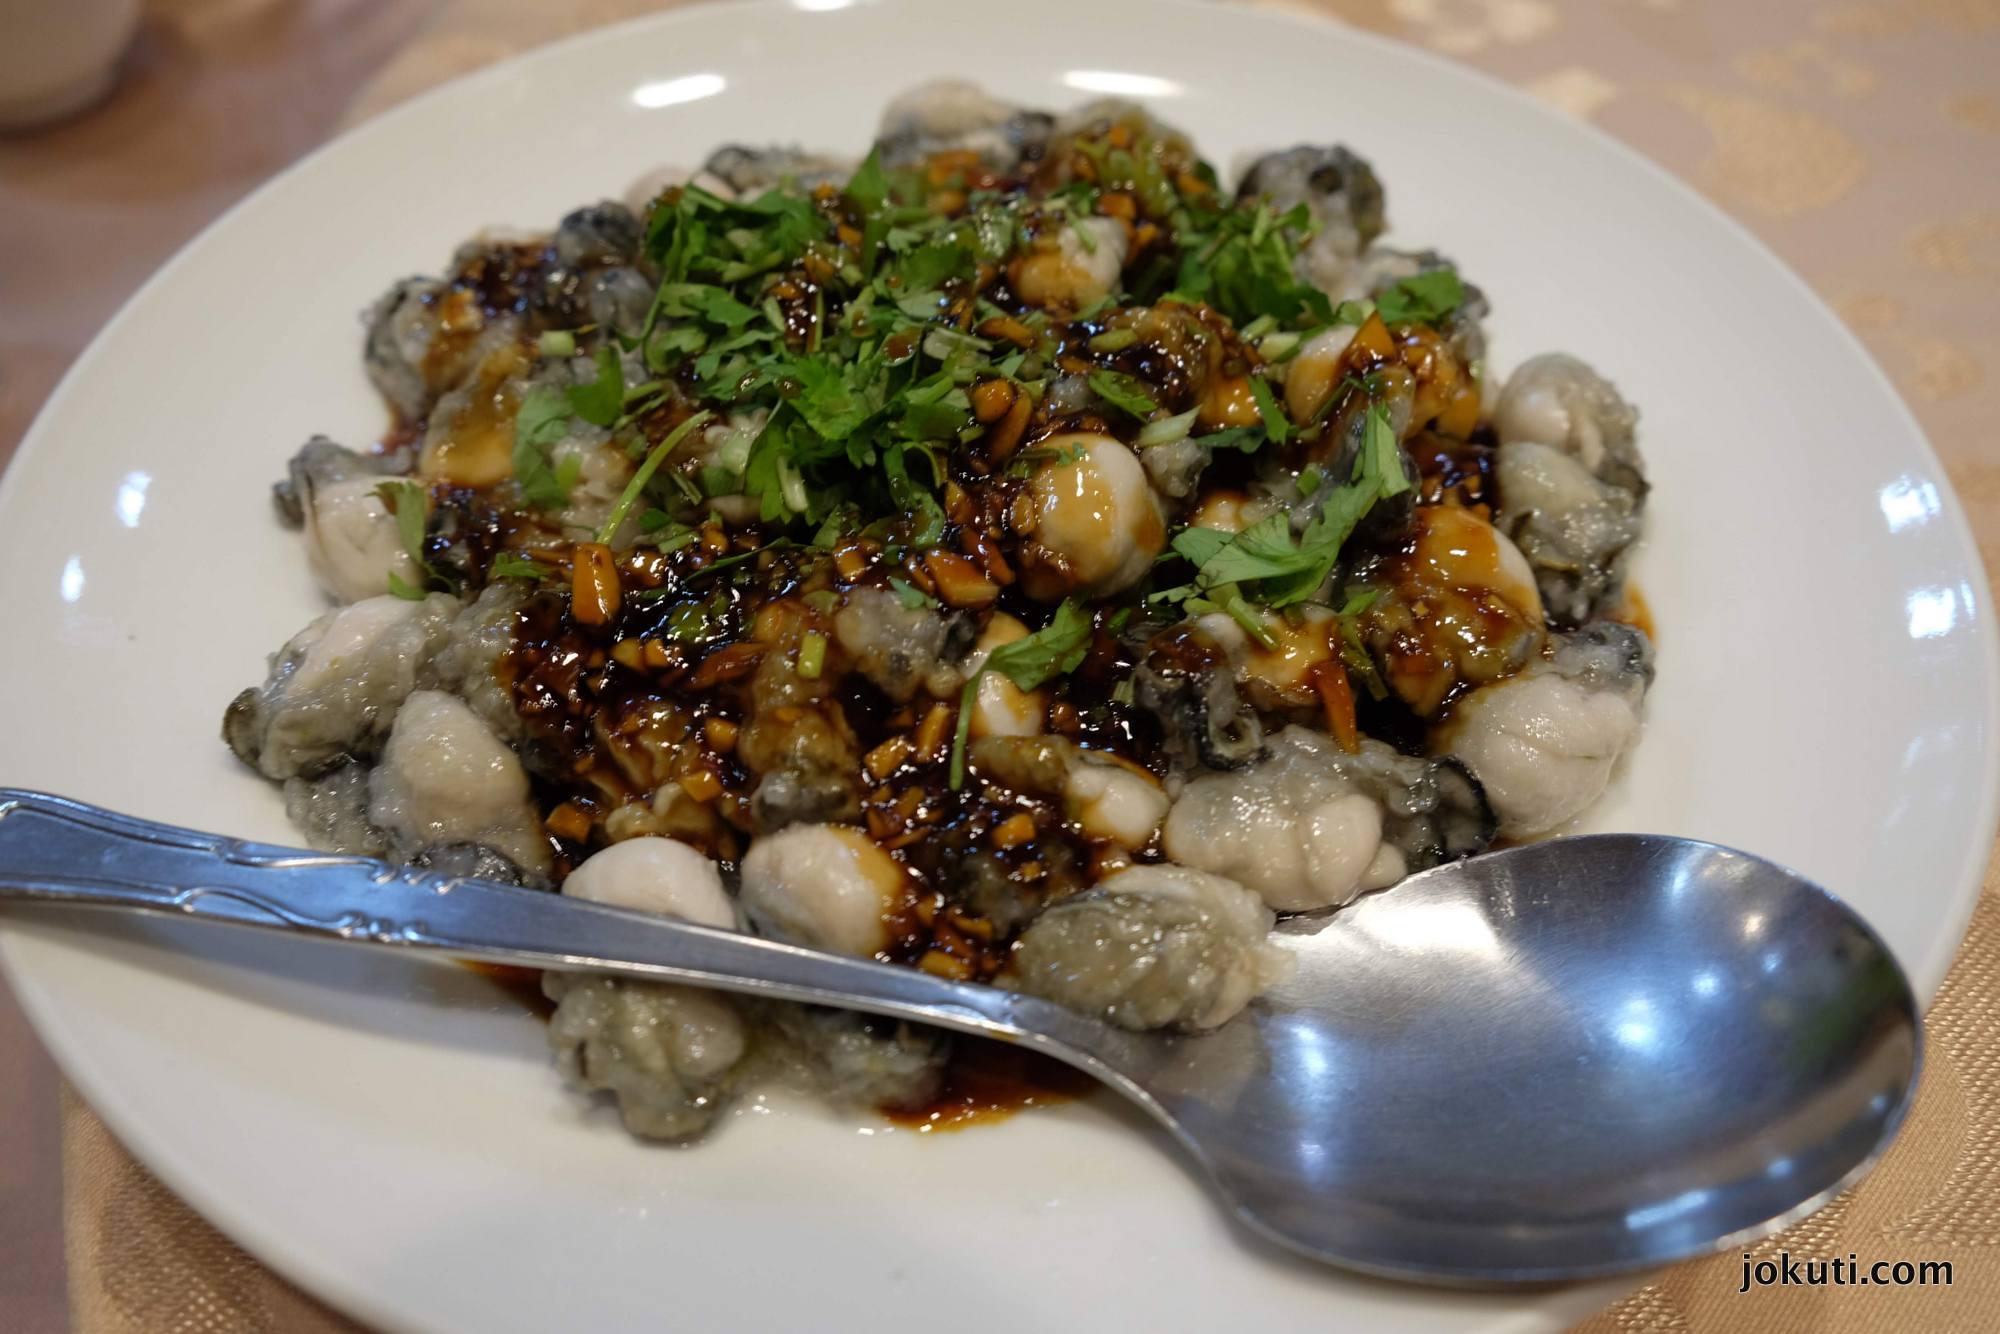 dscf2913_taipei_ming_fu_seafood_michelin_taiwan_vilagevo_jokuti.jpg